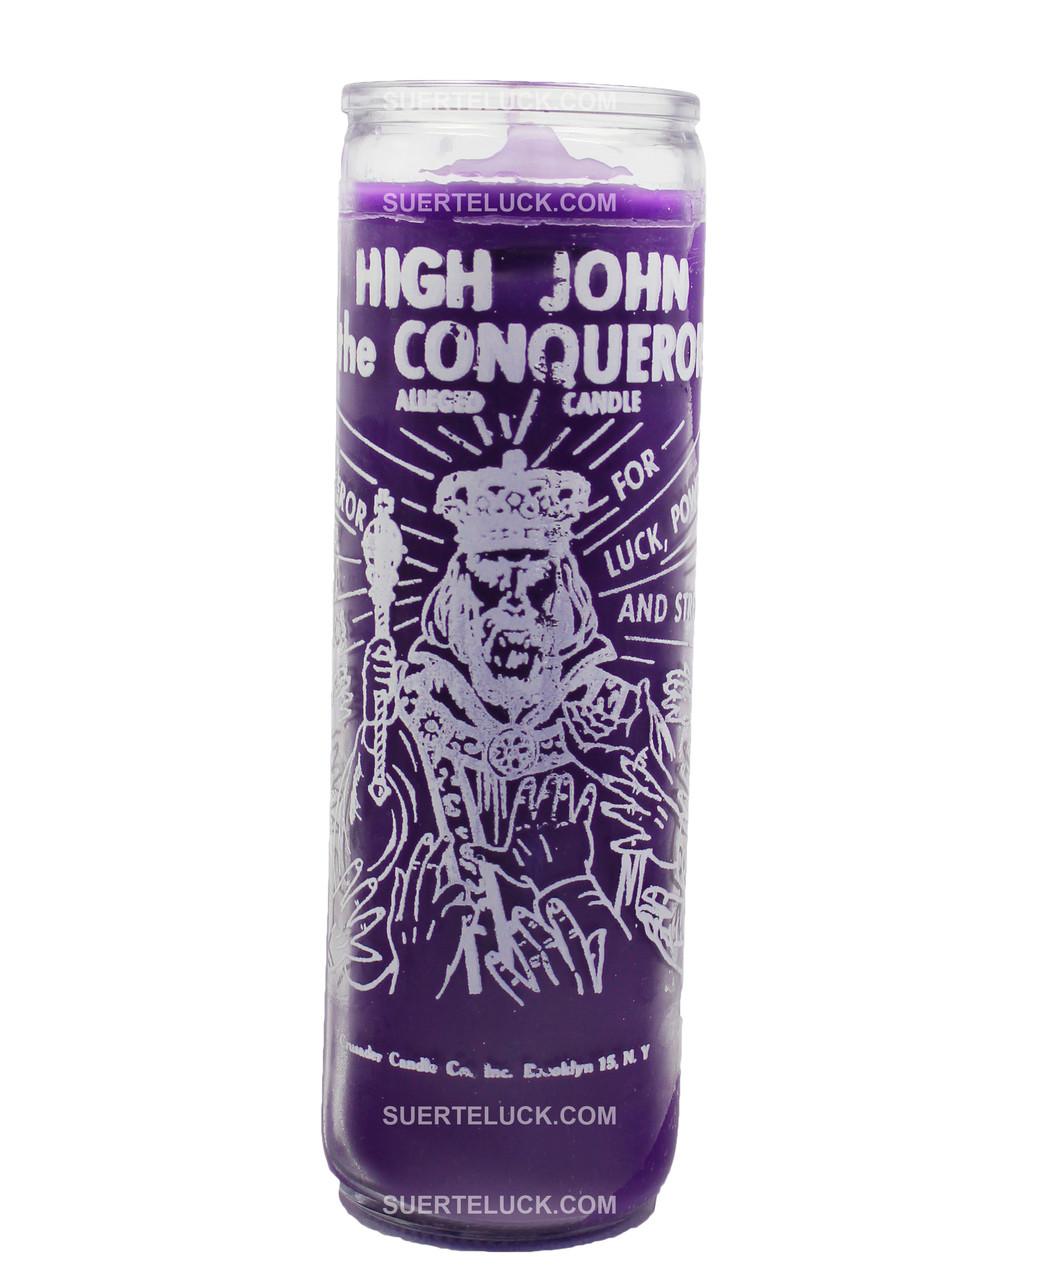 Candle High John The Conqueror- John el Conquistador